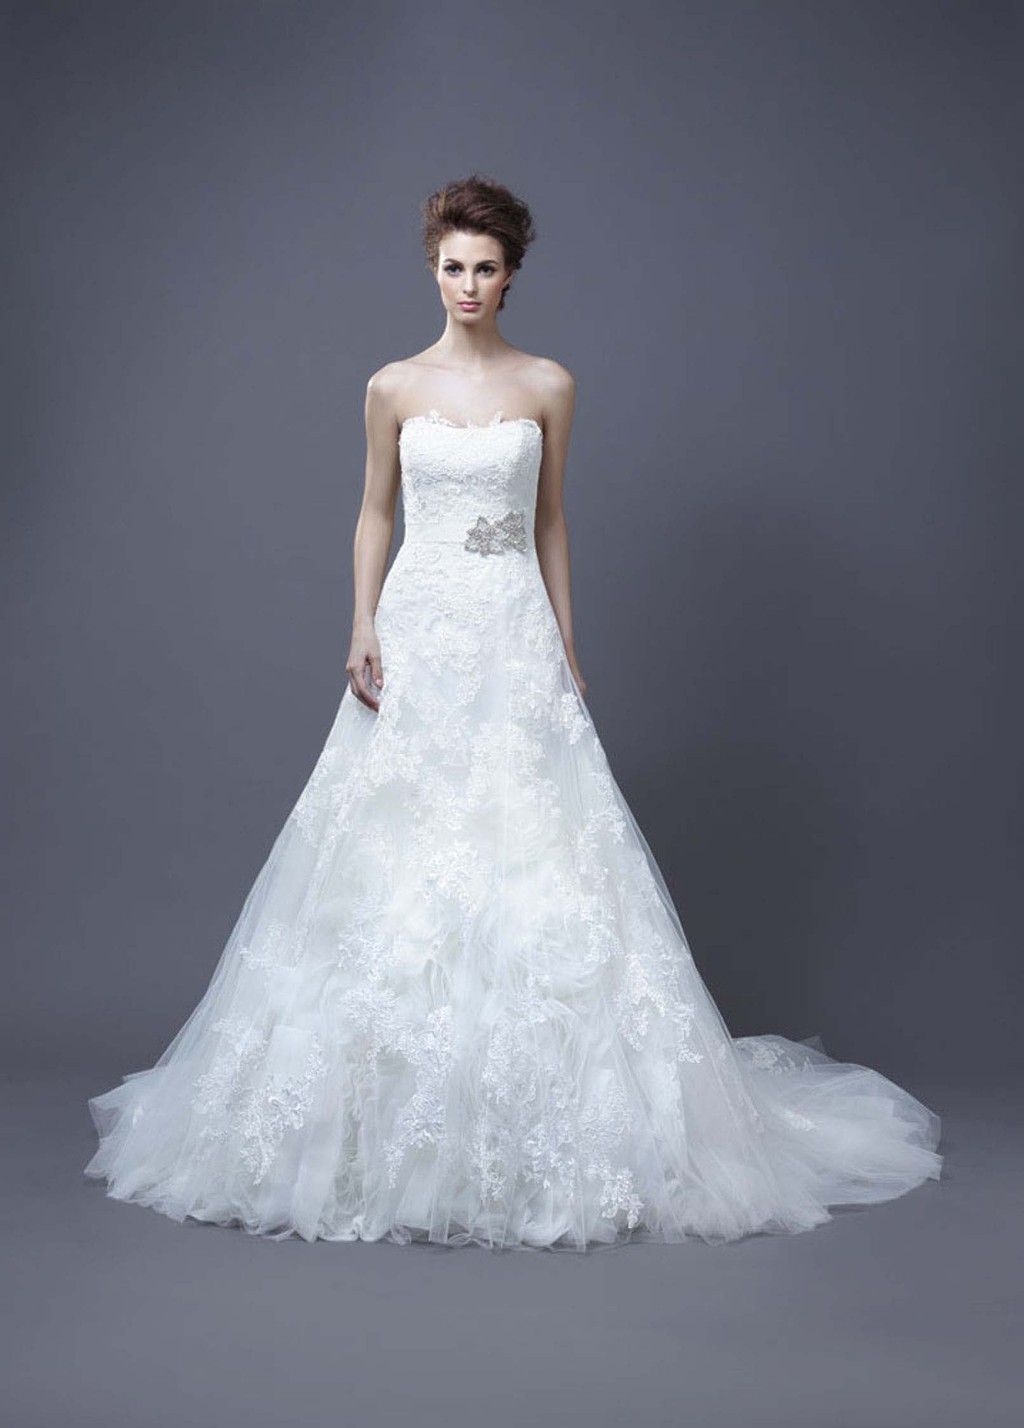 2013-wedding-dress-by-enzoani-bridal-hasina.full